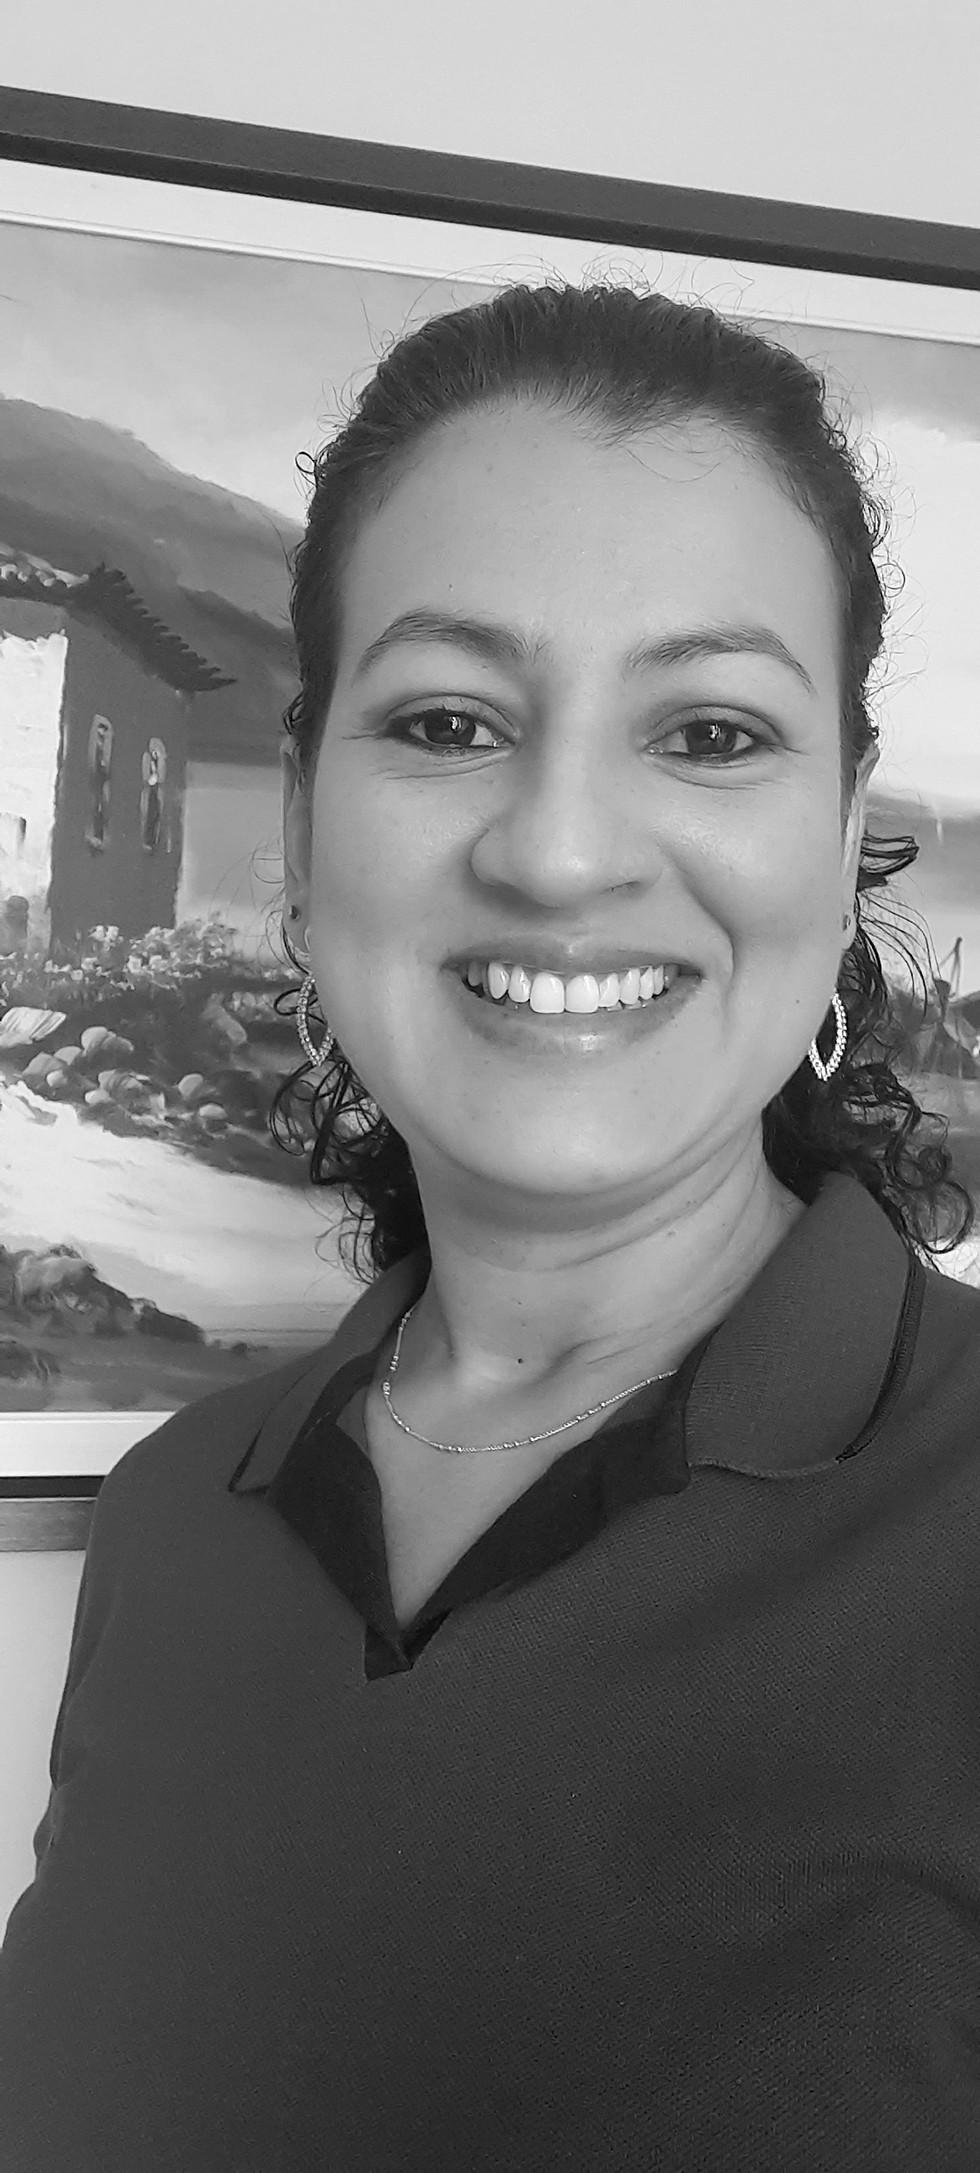 Raphaella Belmont Alves